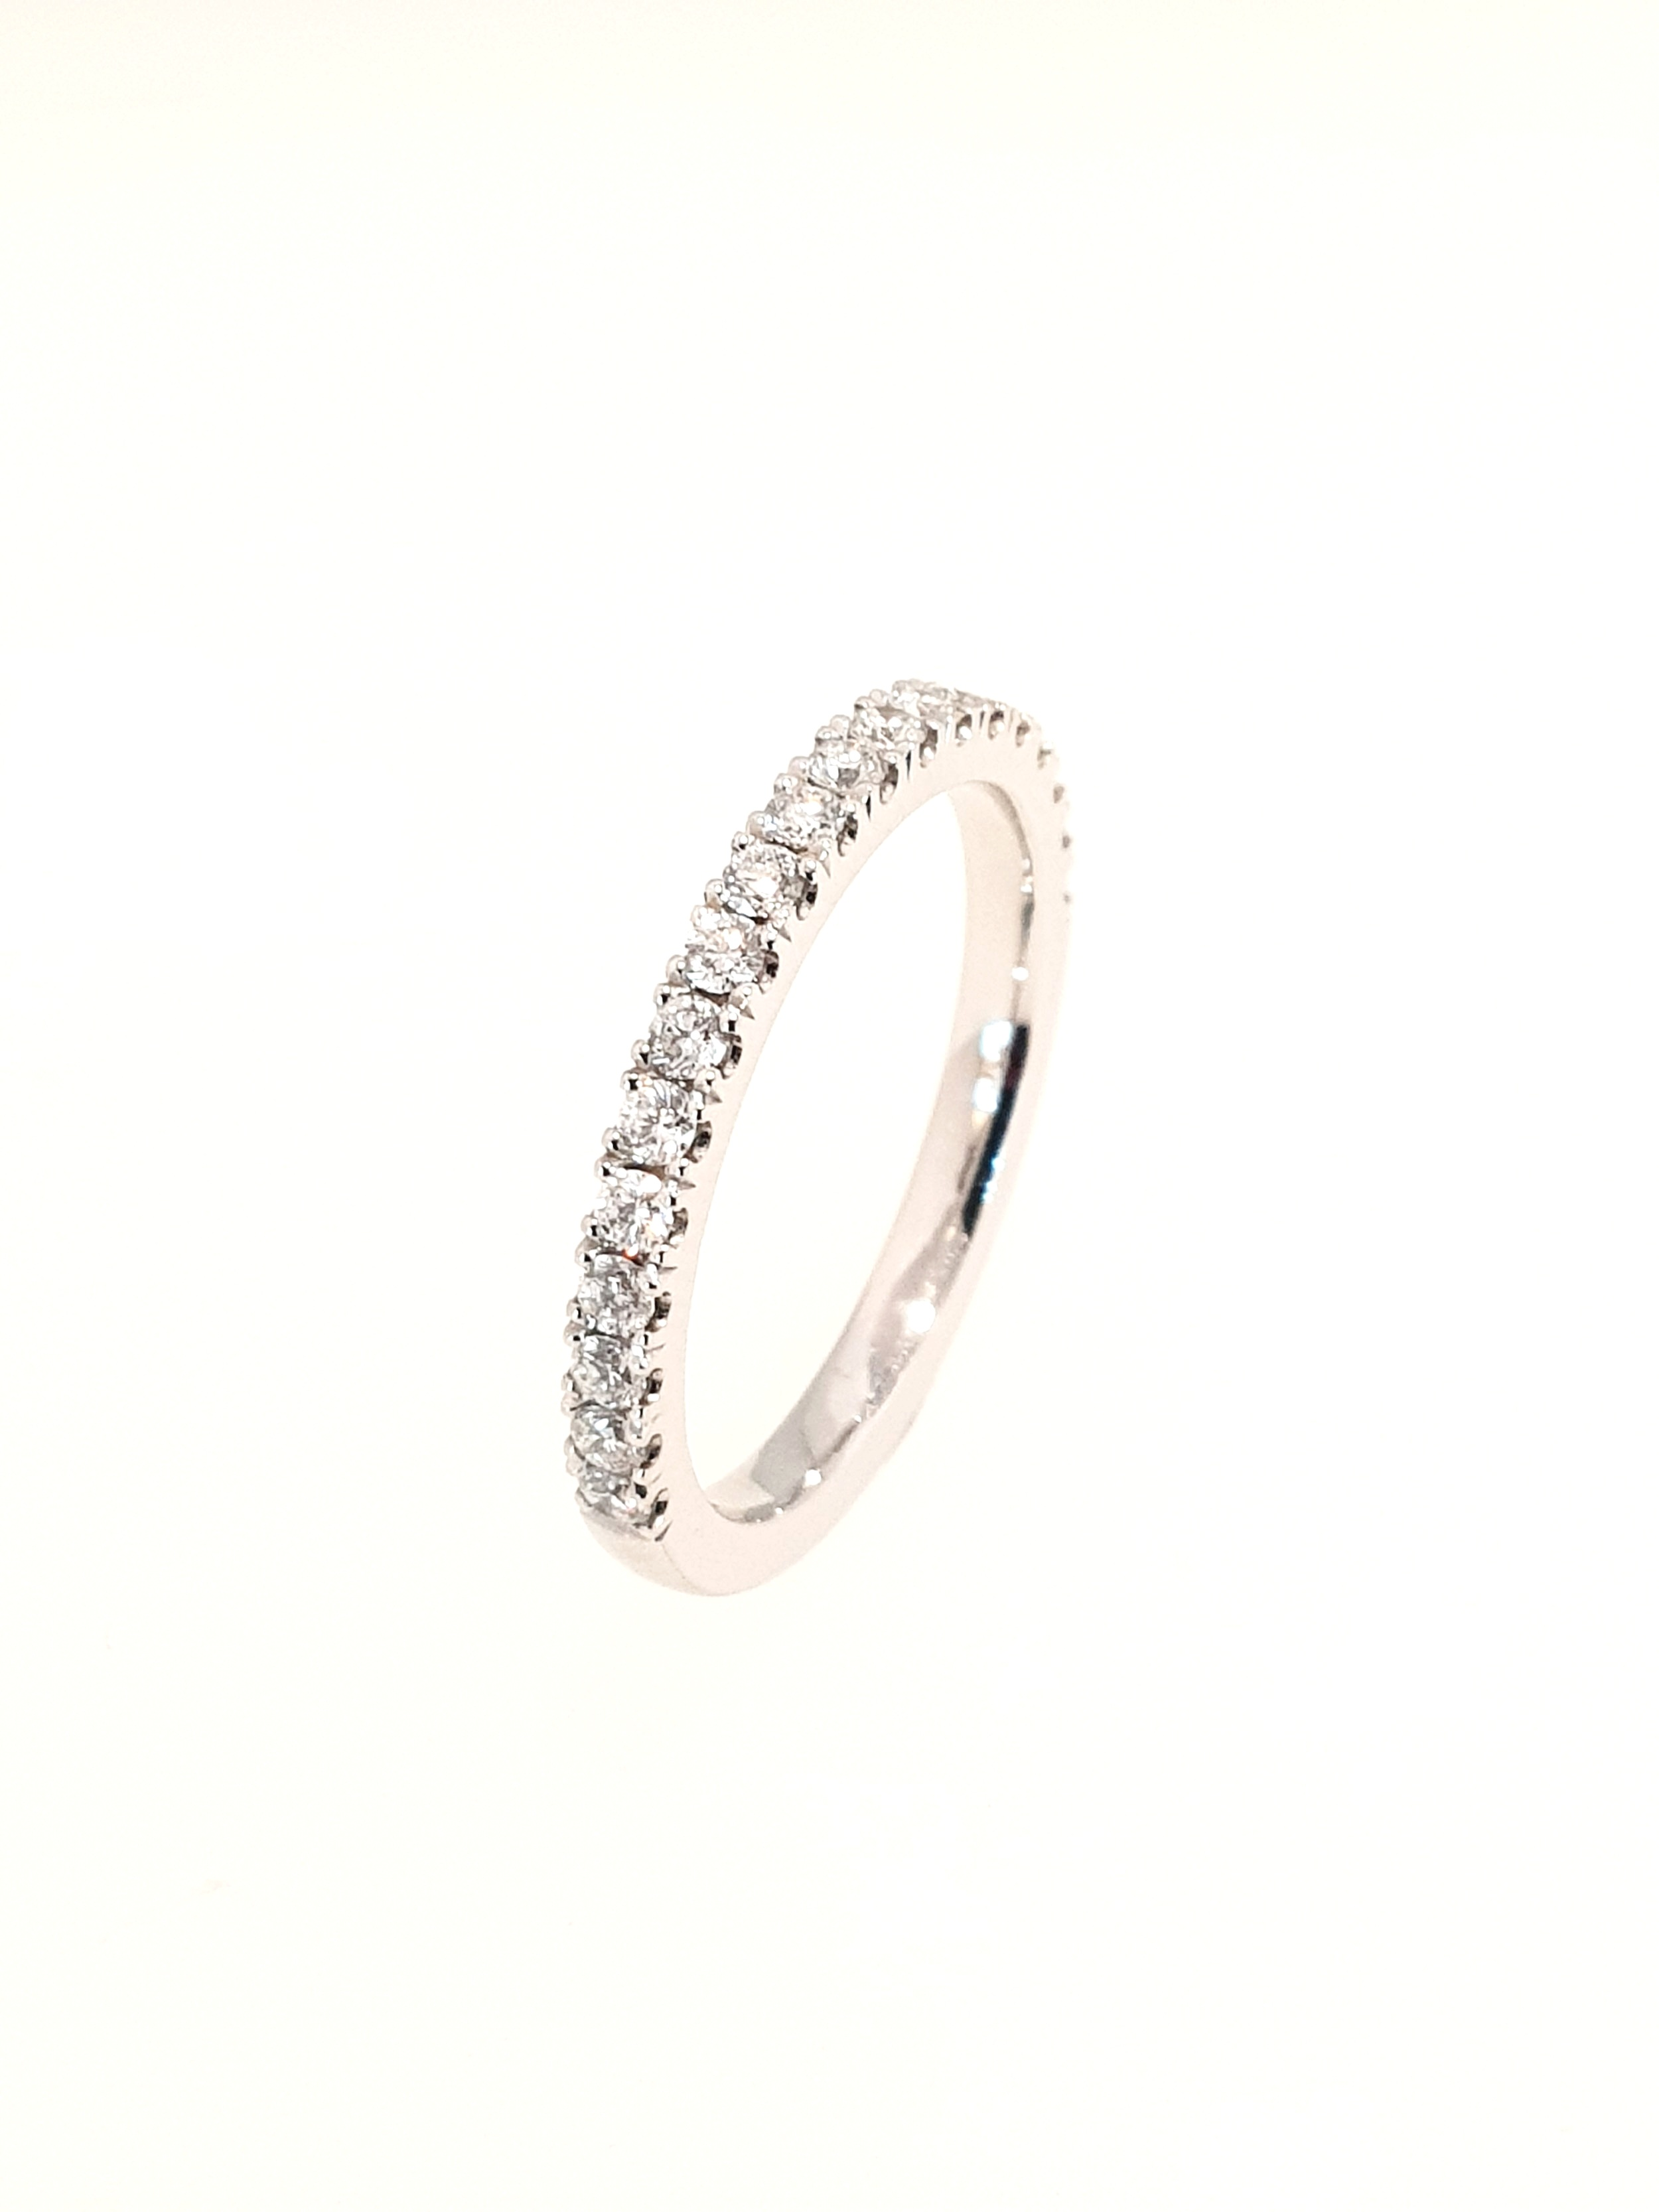 Platinum Eternity Ring  .40ct, F, SI1  Stock Code: N8898  £2100